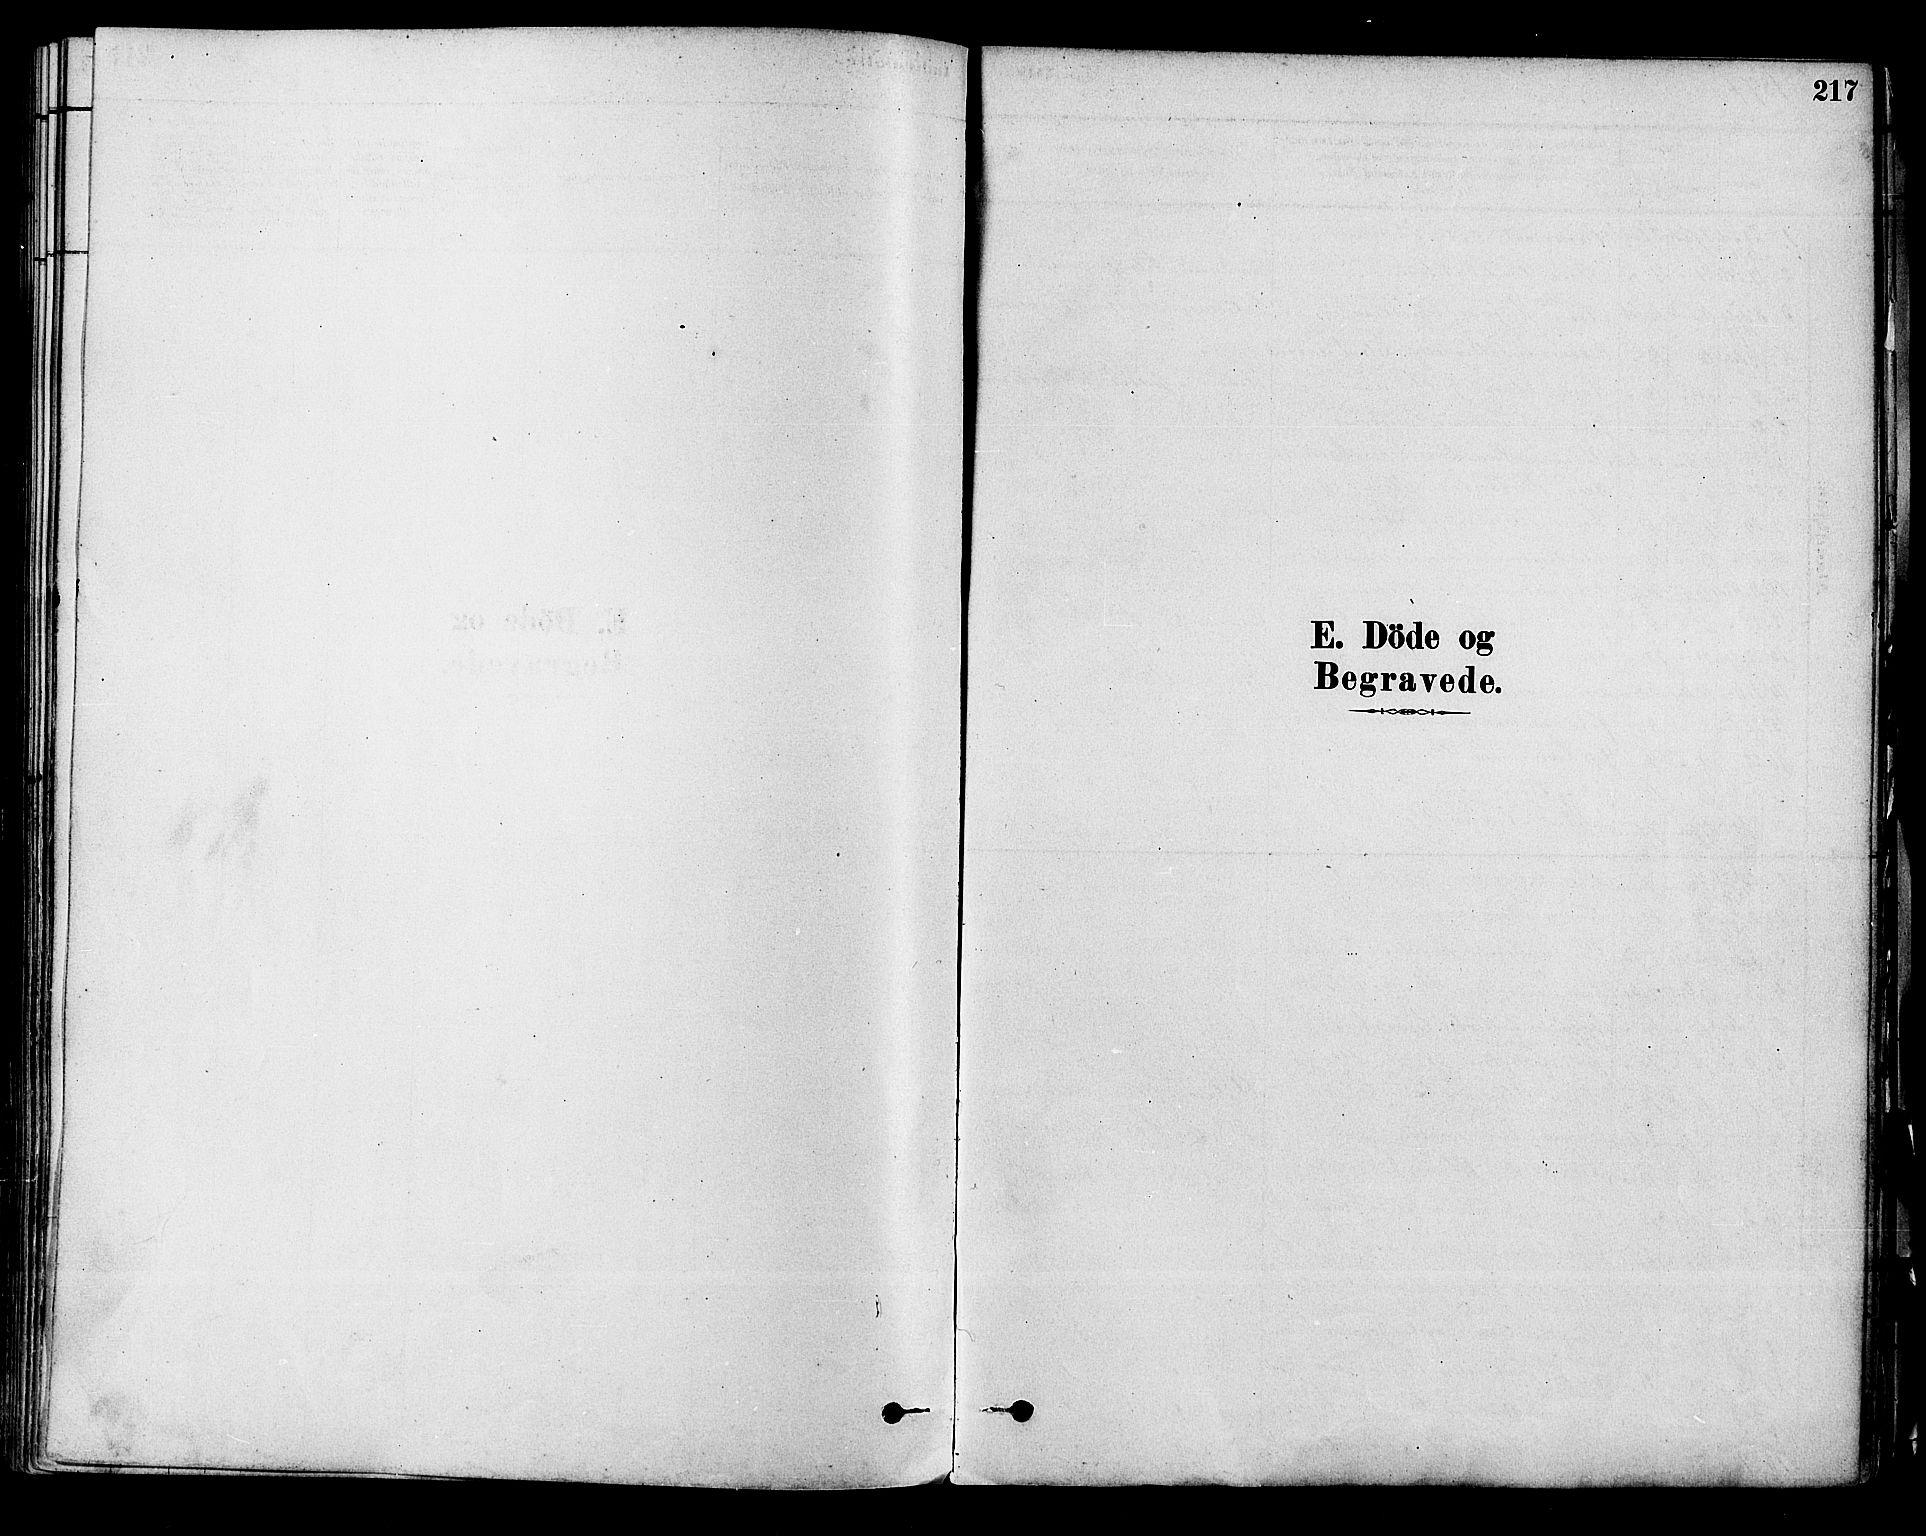 SAKO, Modum kirkebøker, F/Fa/L0011: Ministerialbok nr. 11, 1877-1889, s. 217